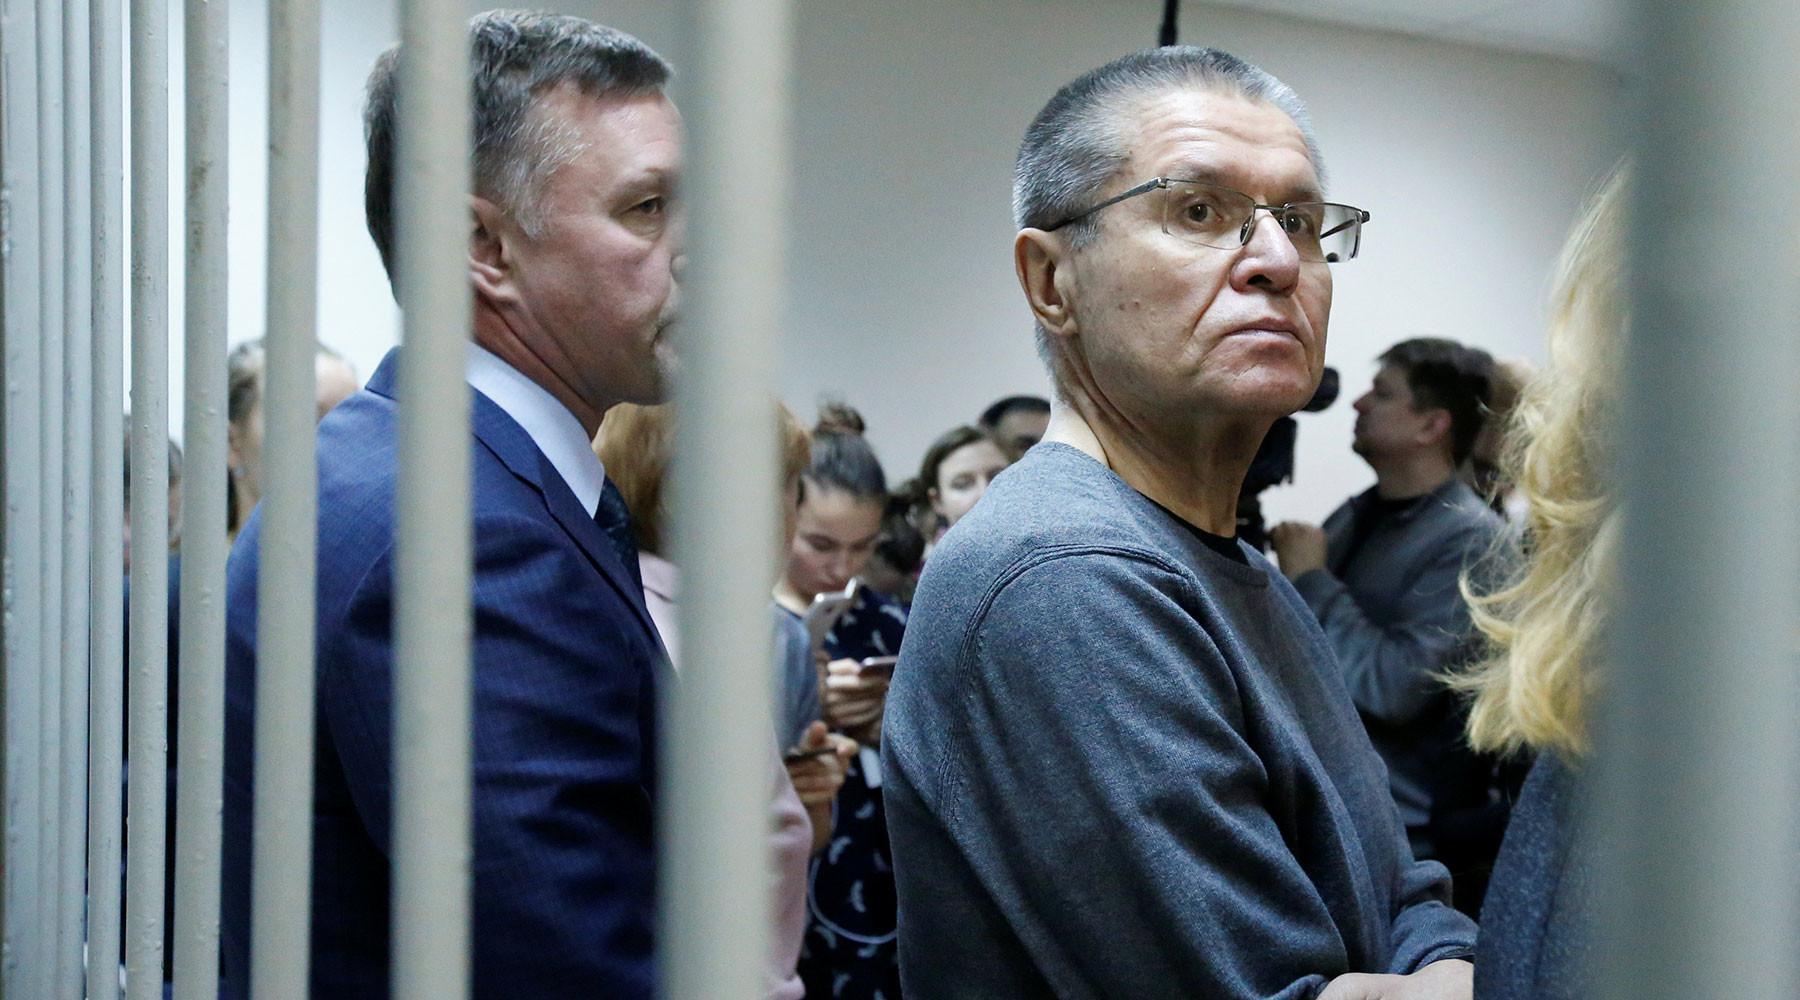 Суд приговорил Улюкаева к 8 годам строгого режима